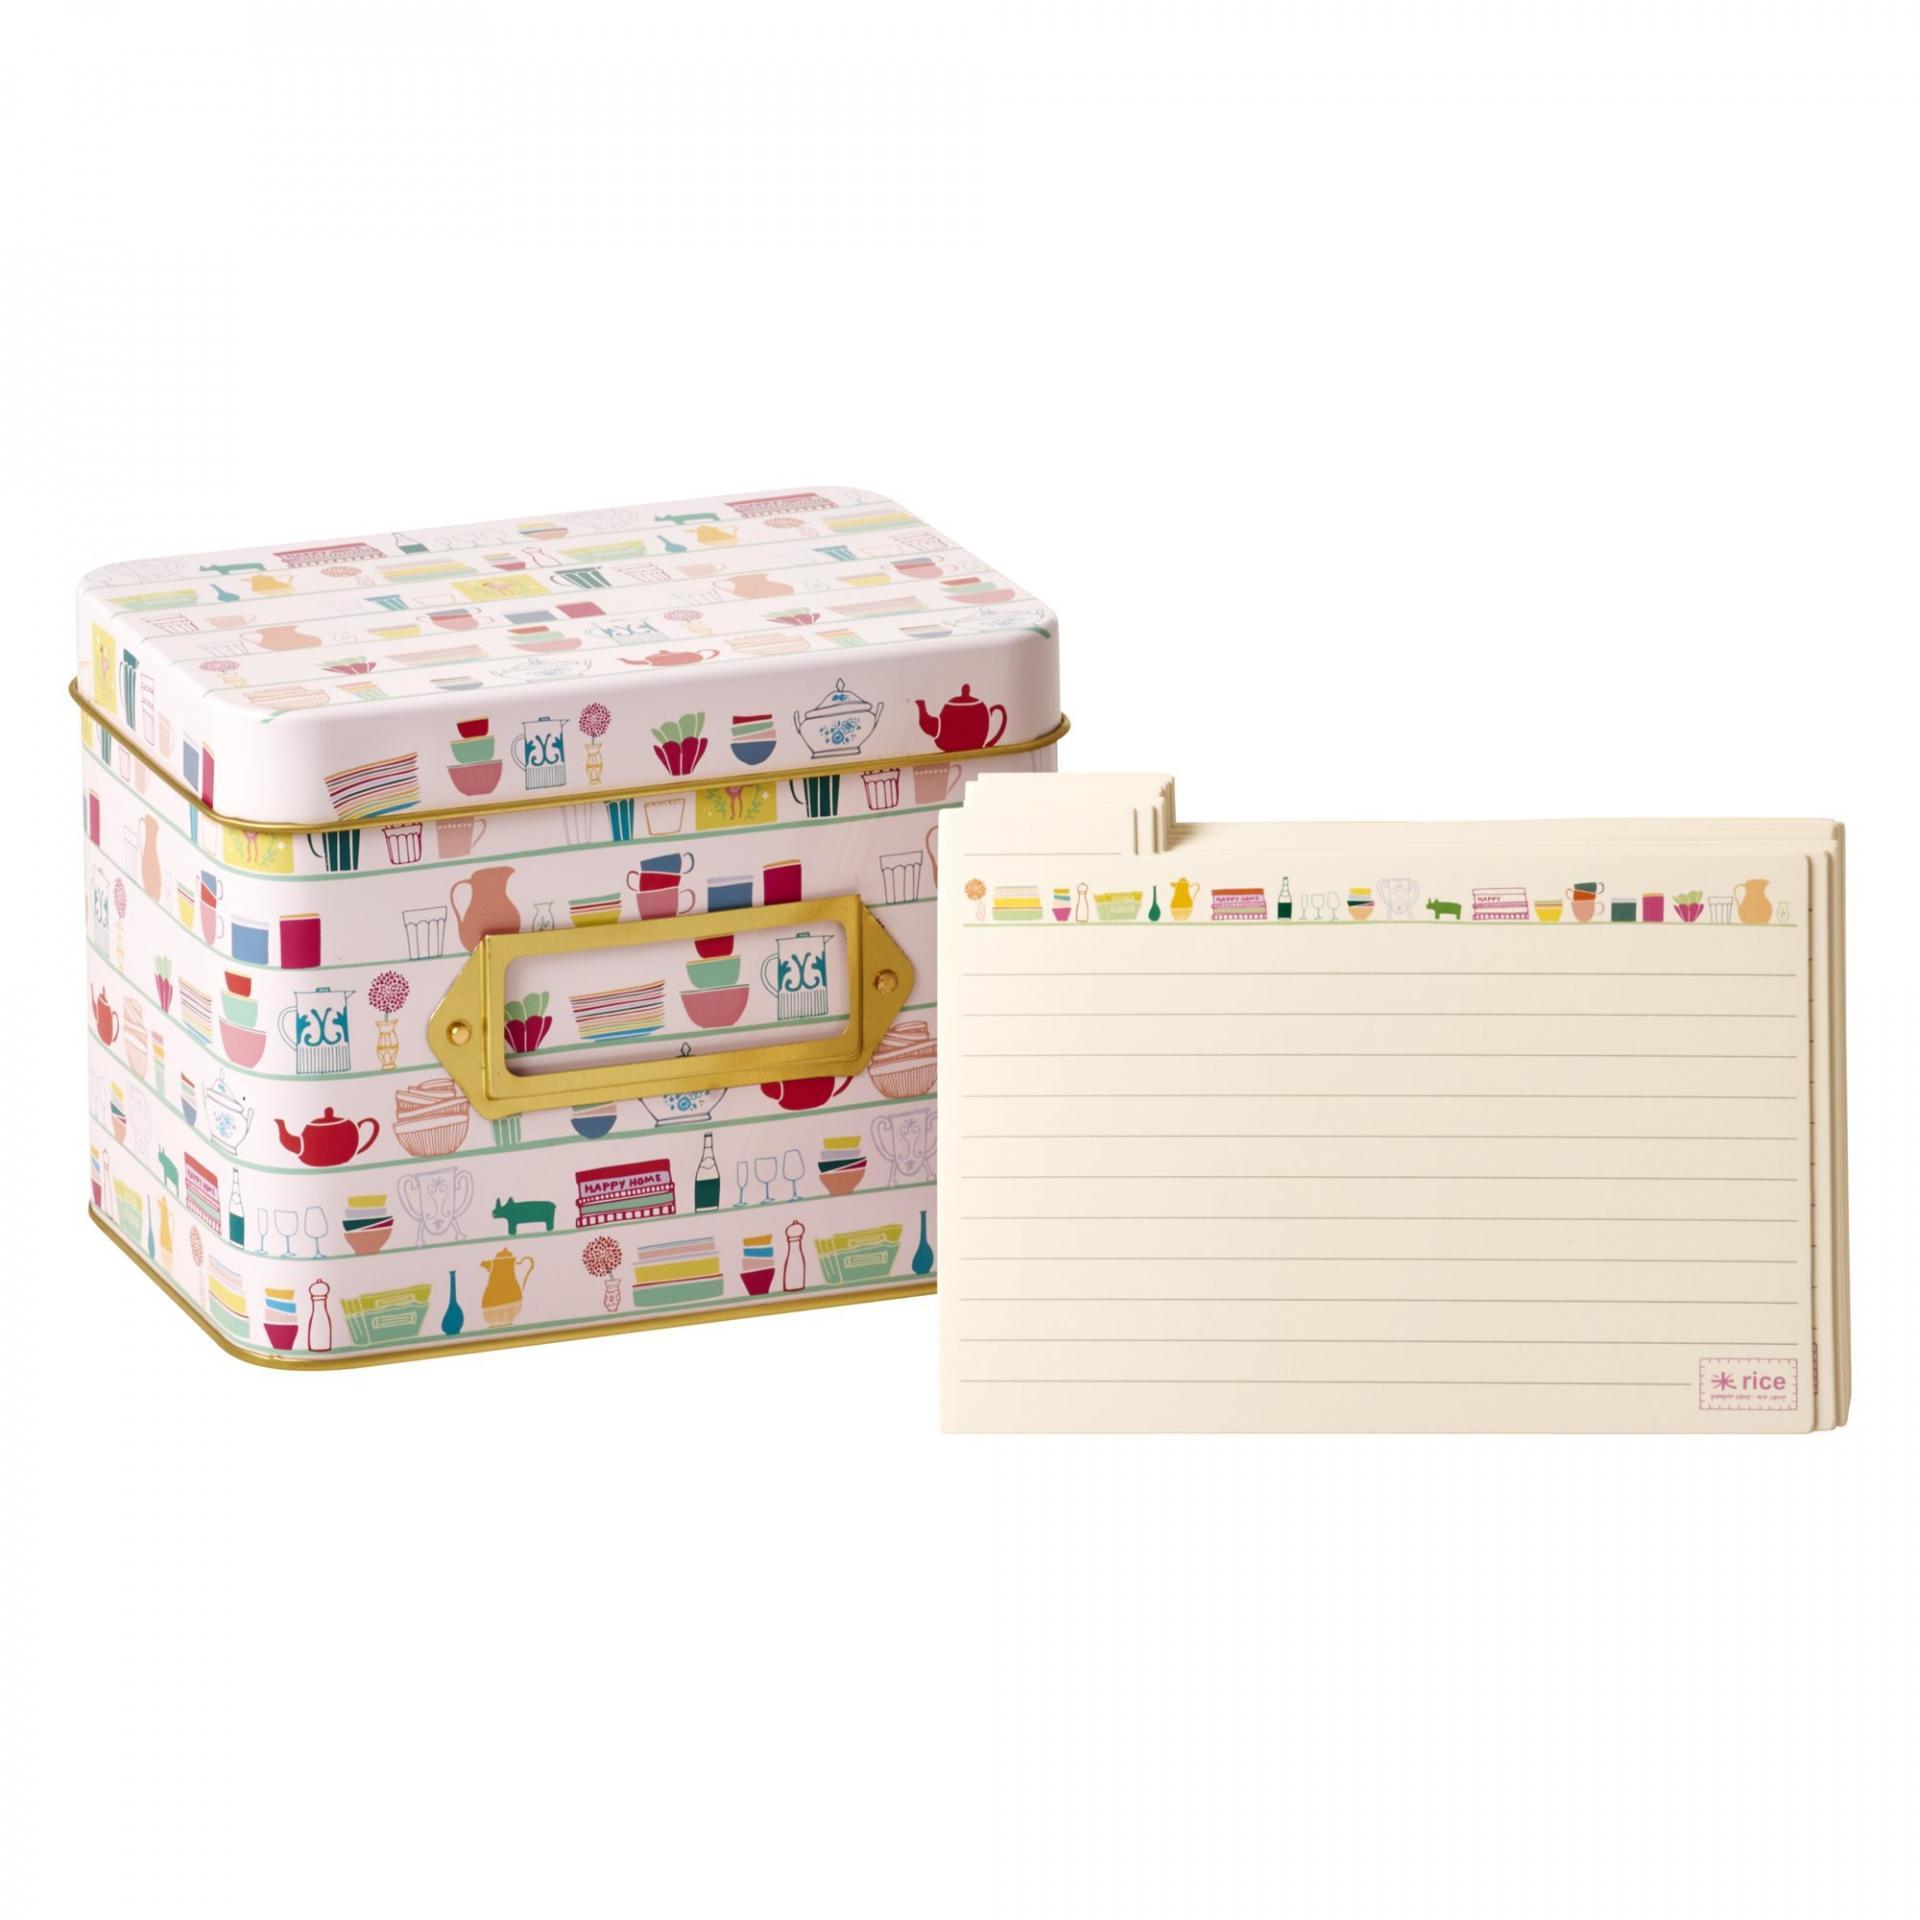 rice Plechový box s 40 lístečky na recepty, růžová barva, kov